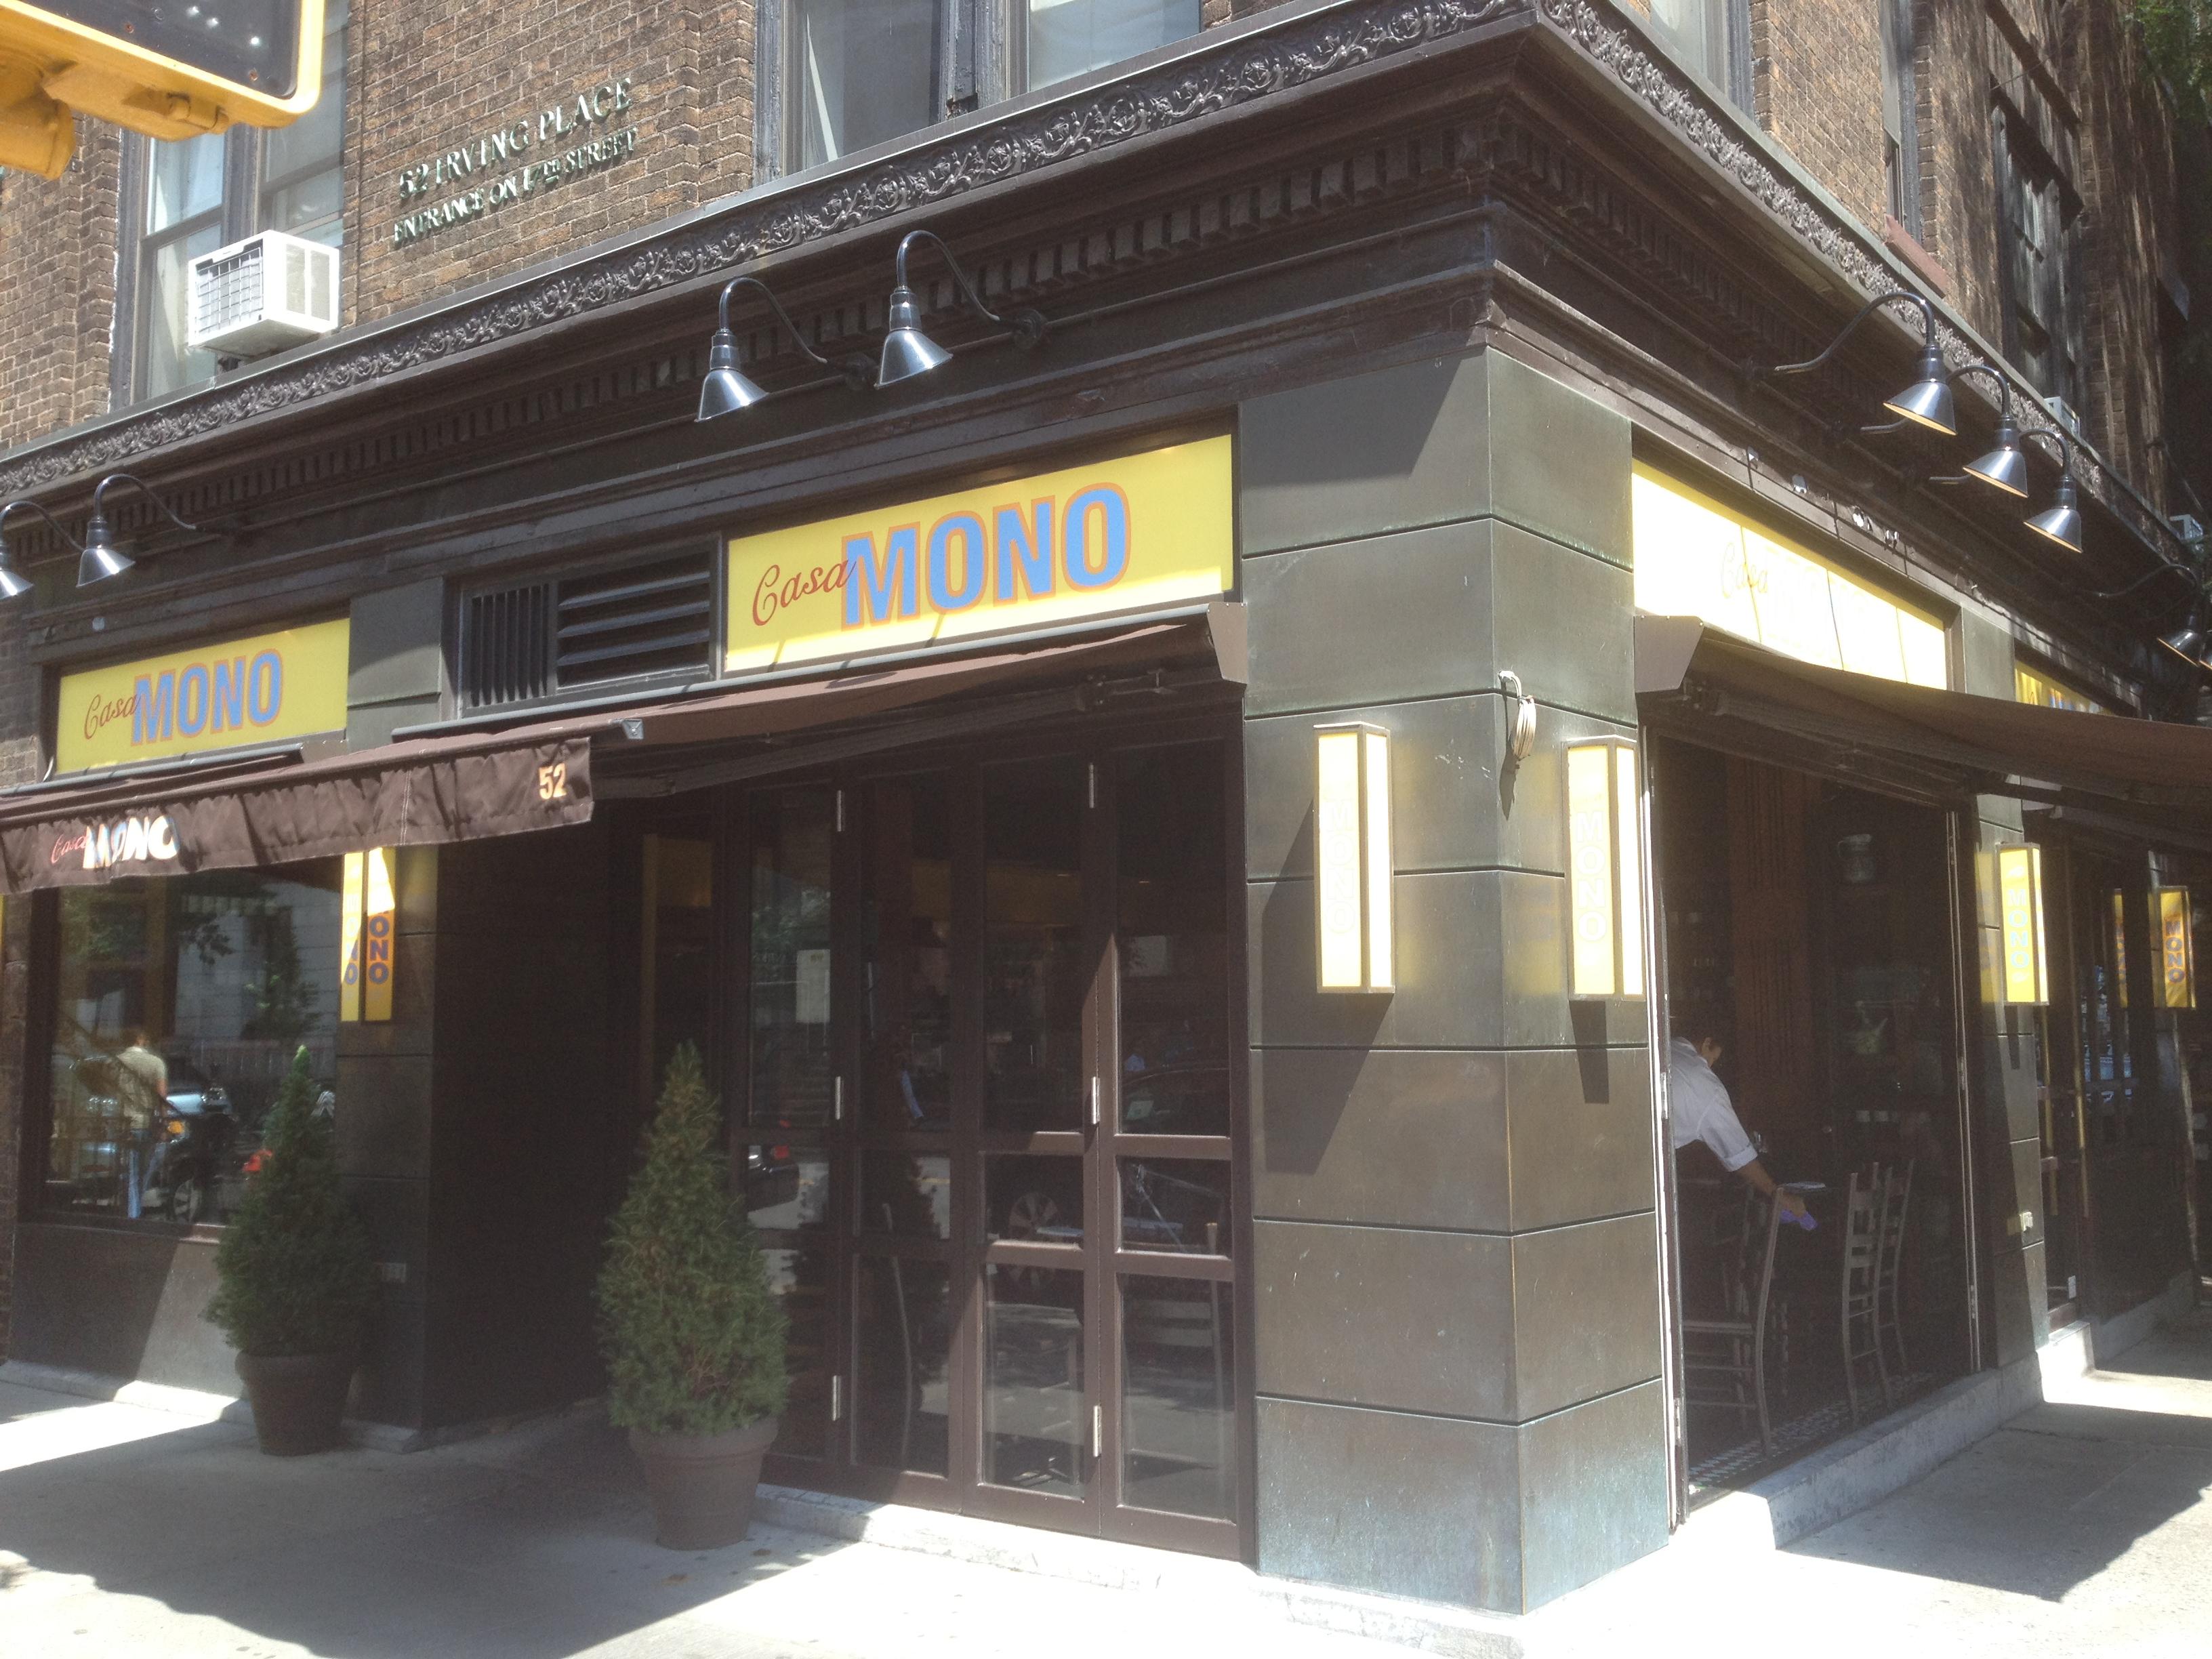 Mario batali you casa mono you yes chef batali rocks - Casa mono restaurante ...